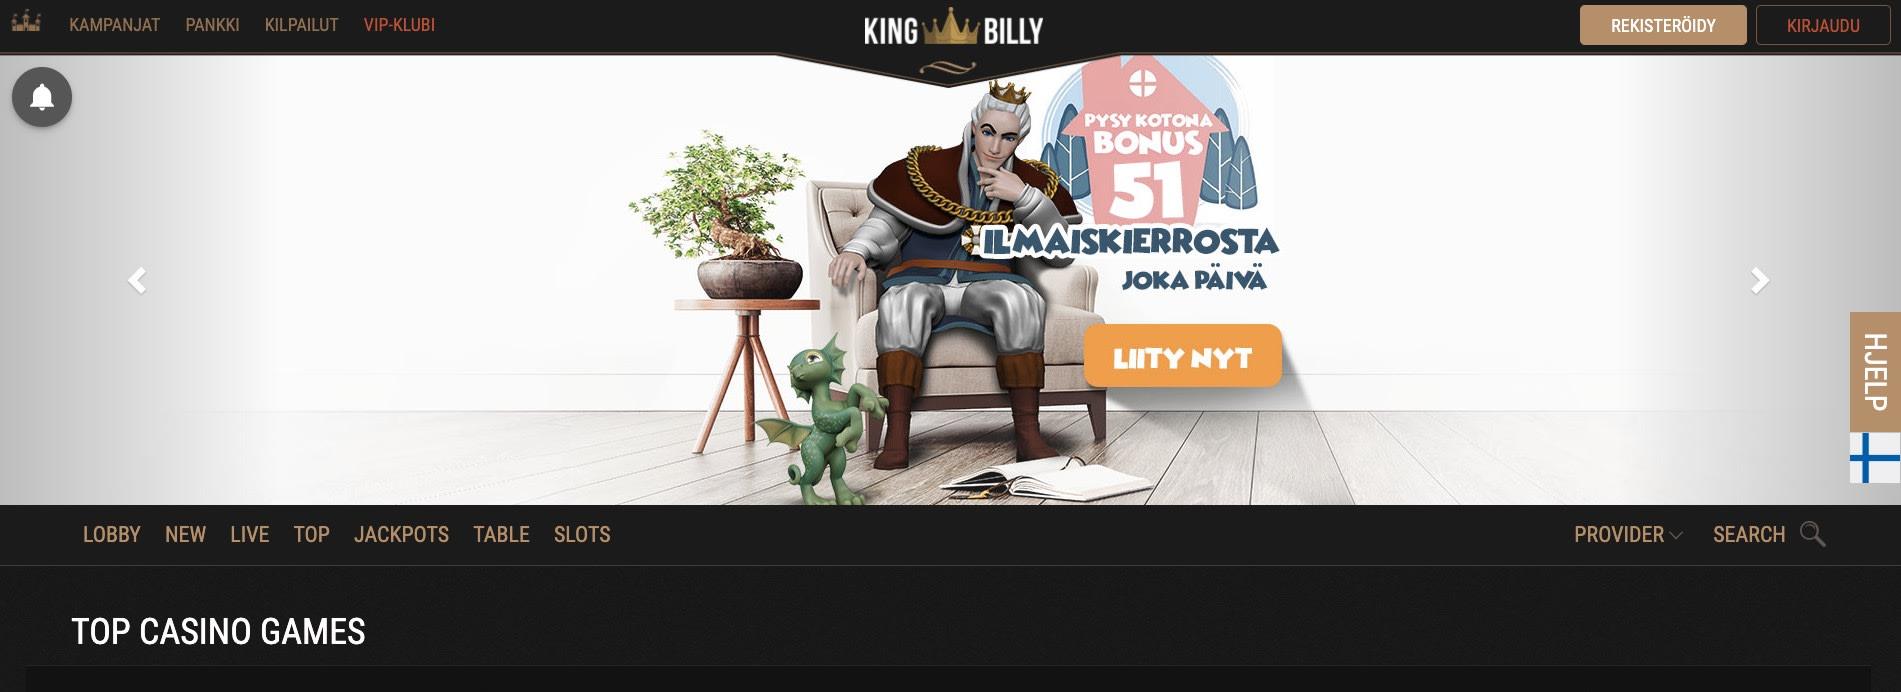 King Billy Casino etusivu